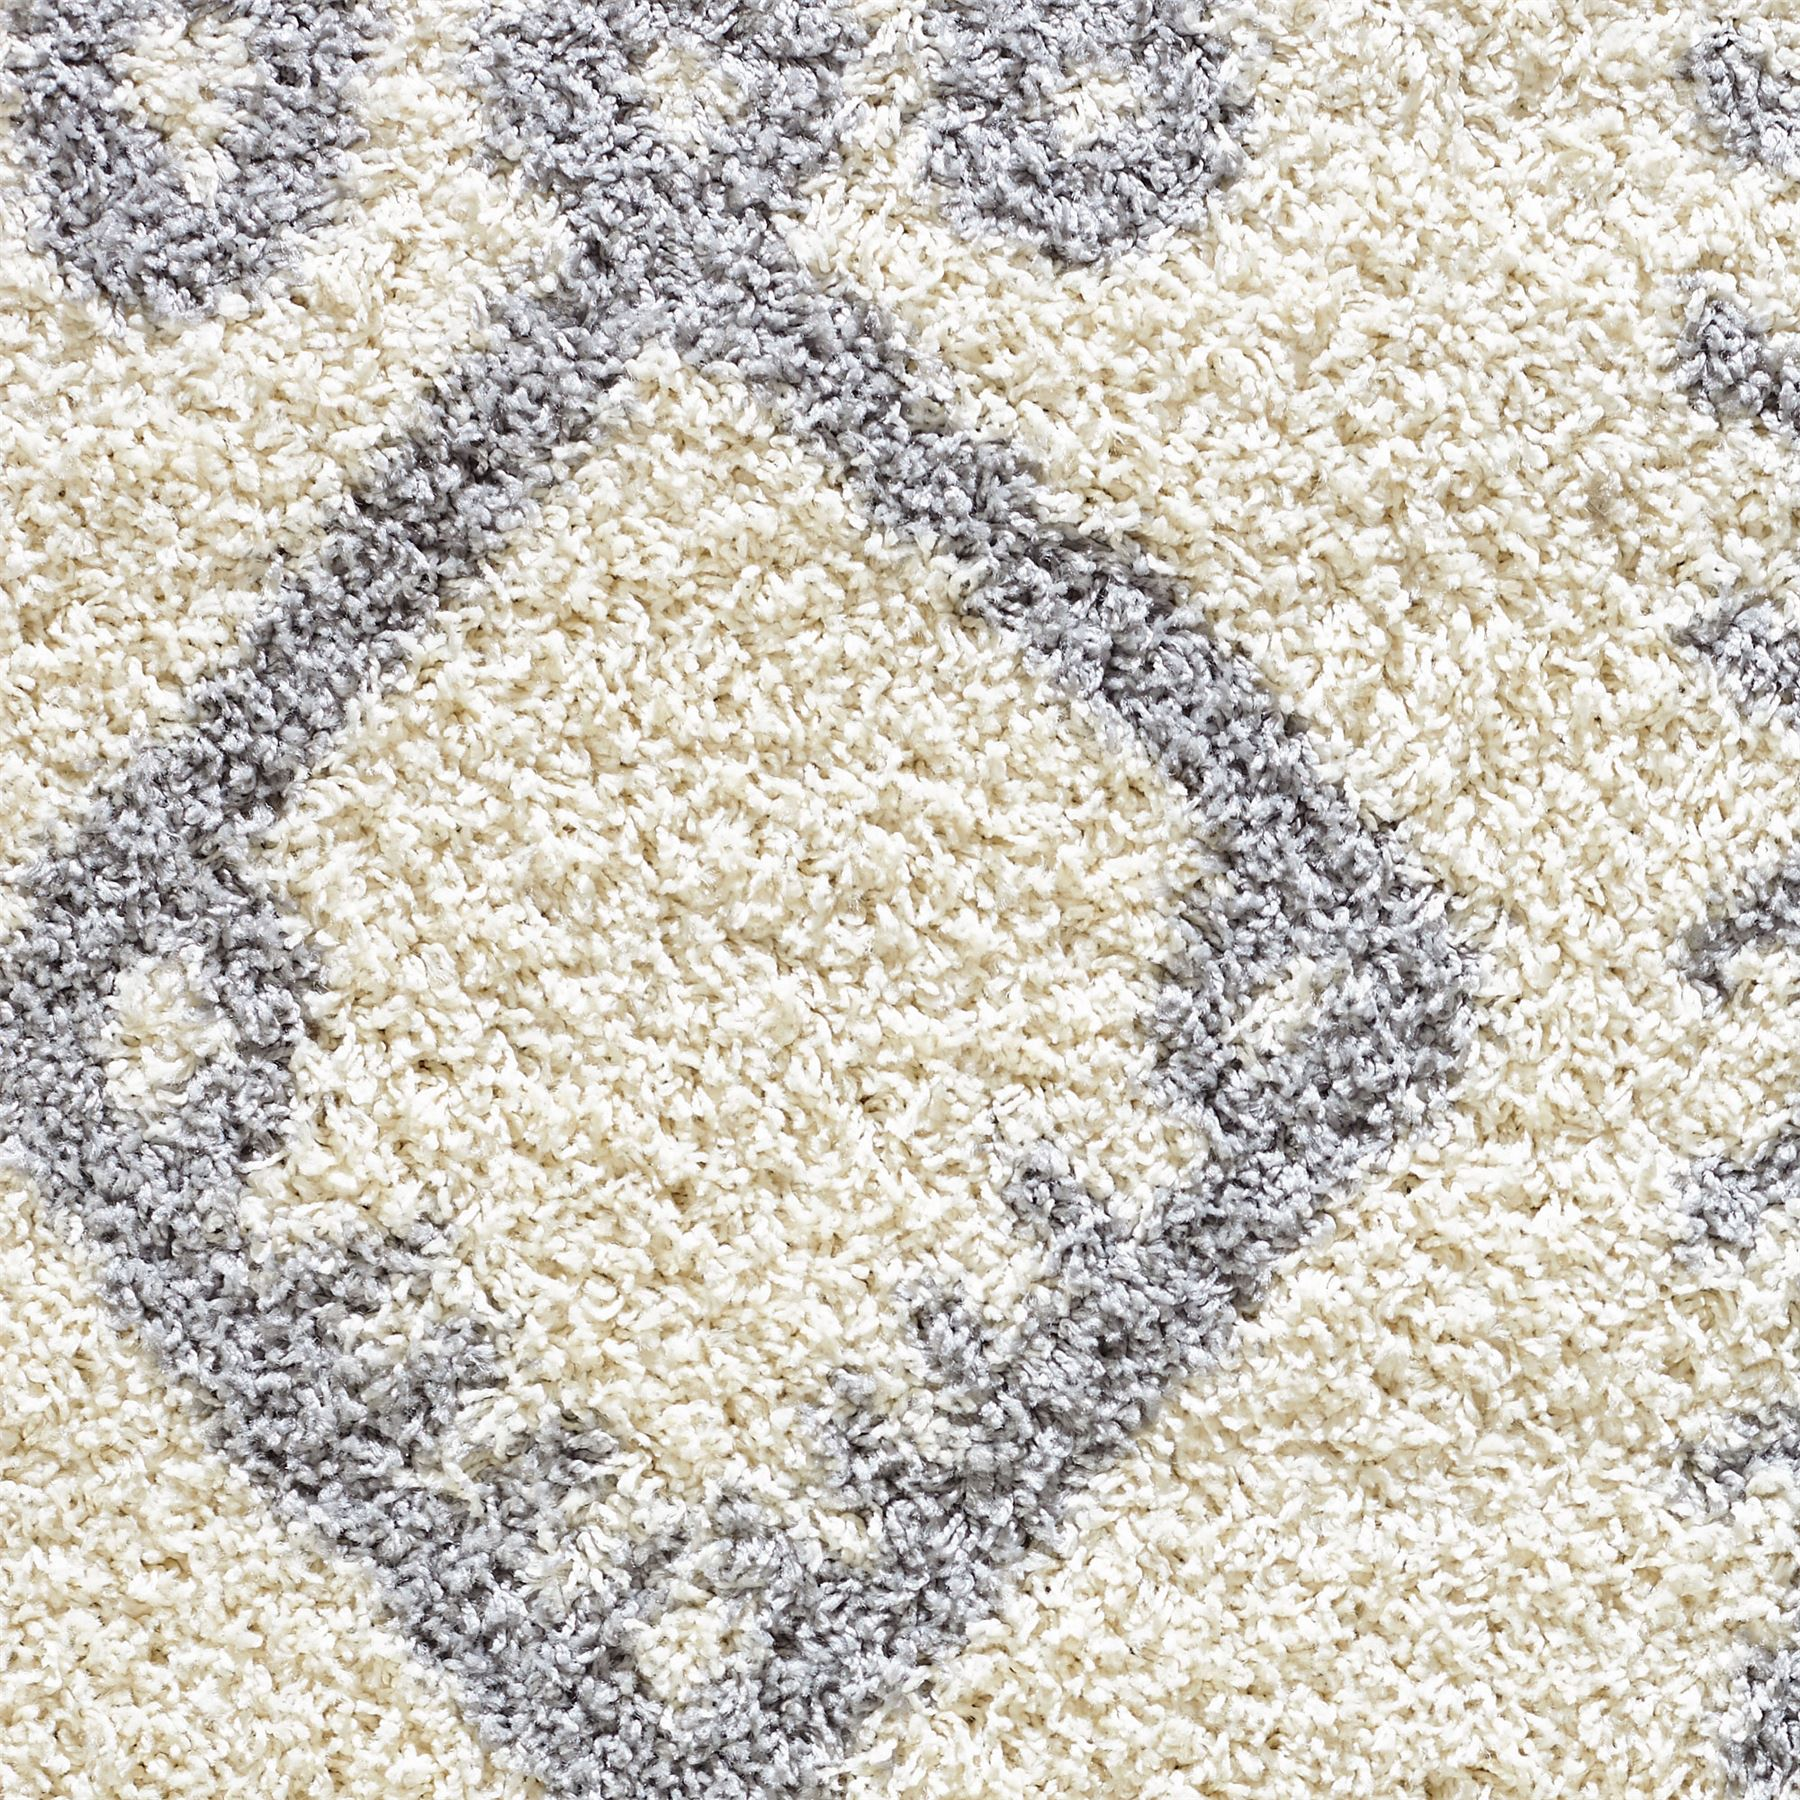 Moroccan-Shaggy-Area-Rug-Grey-White-Black-Soft-Carpet-Traditional-Berber-Designs thumbnail 22